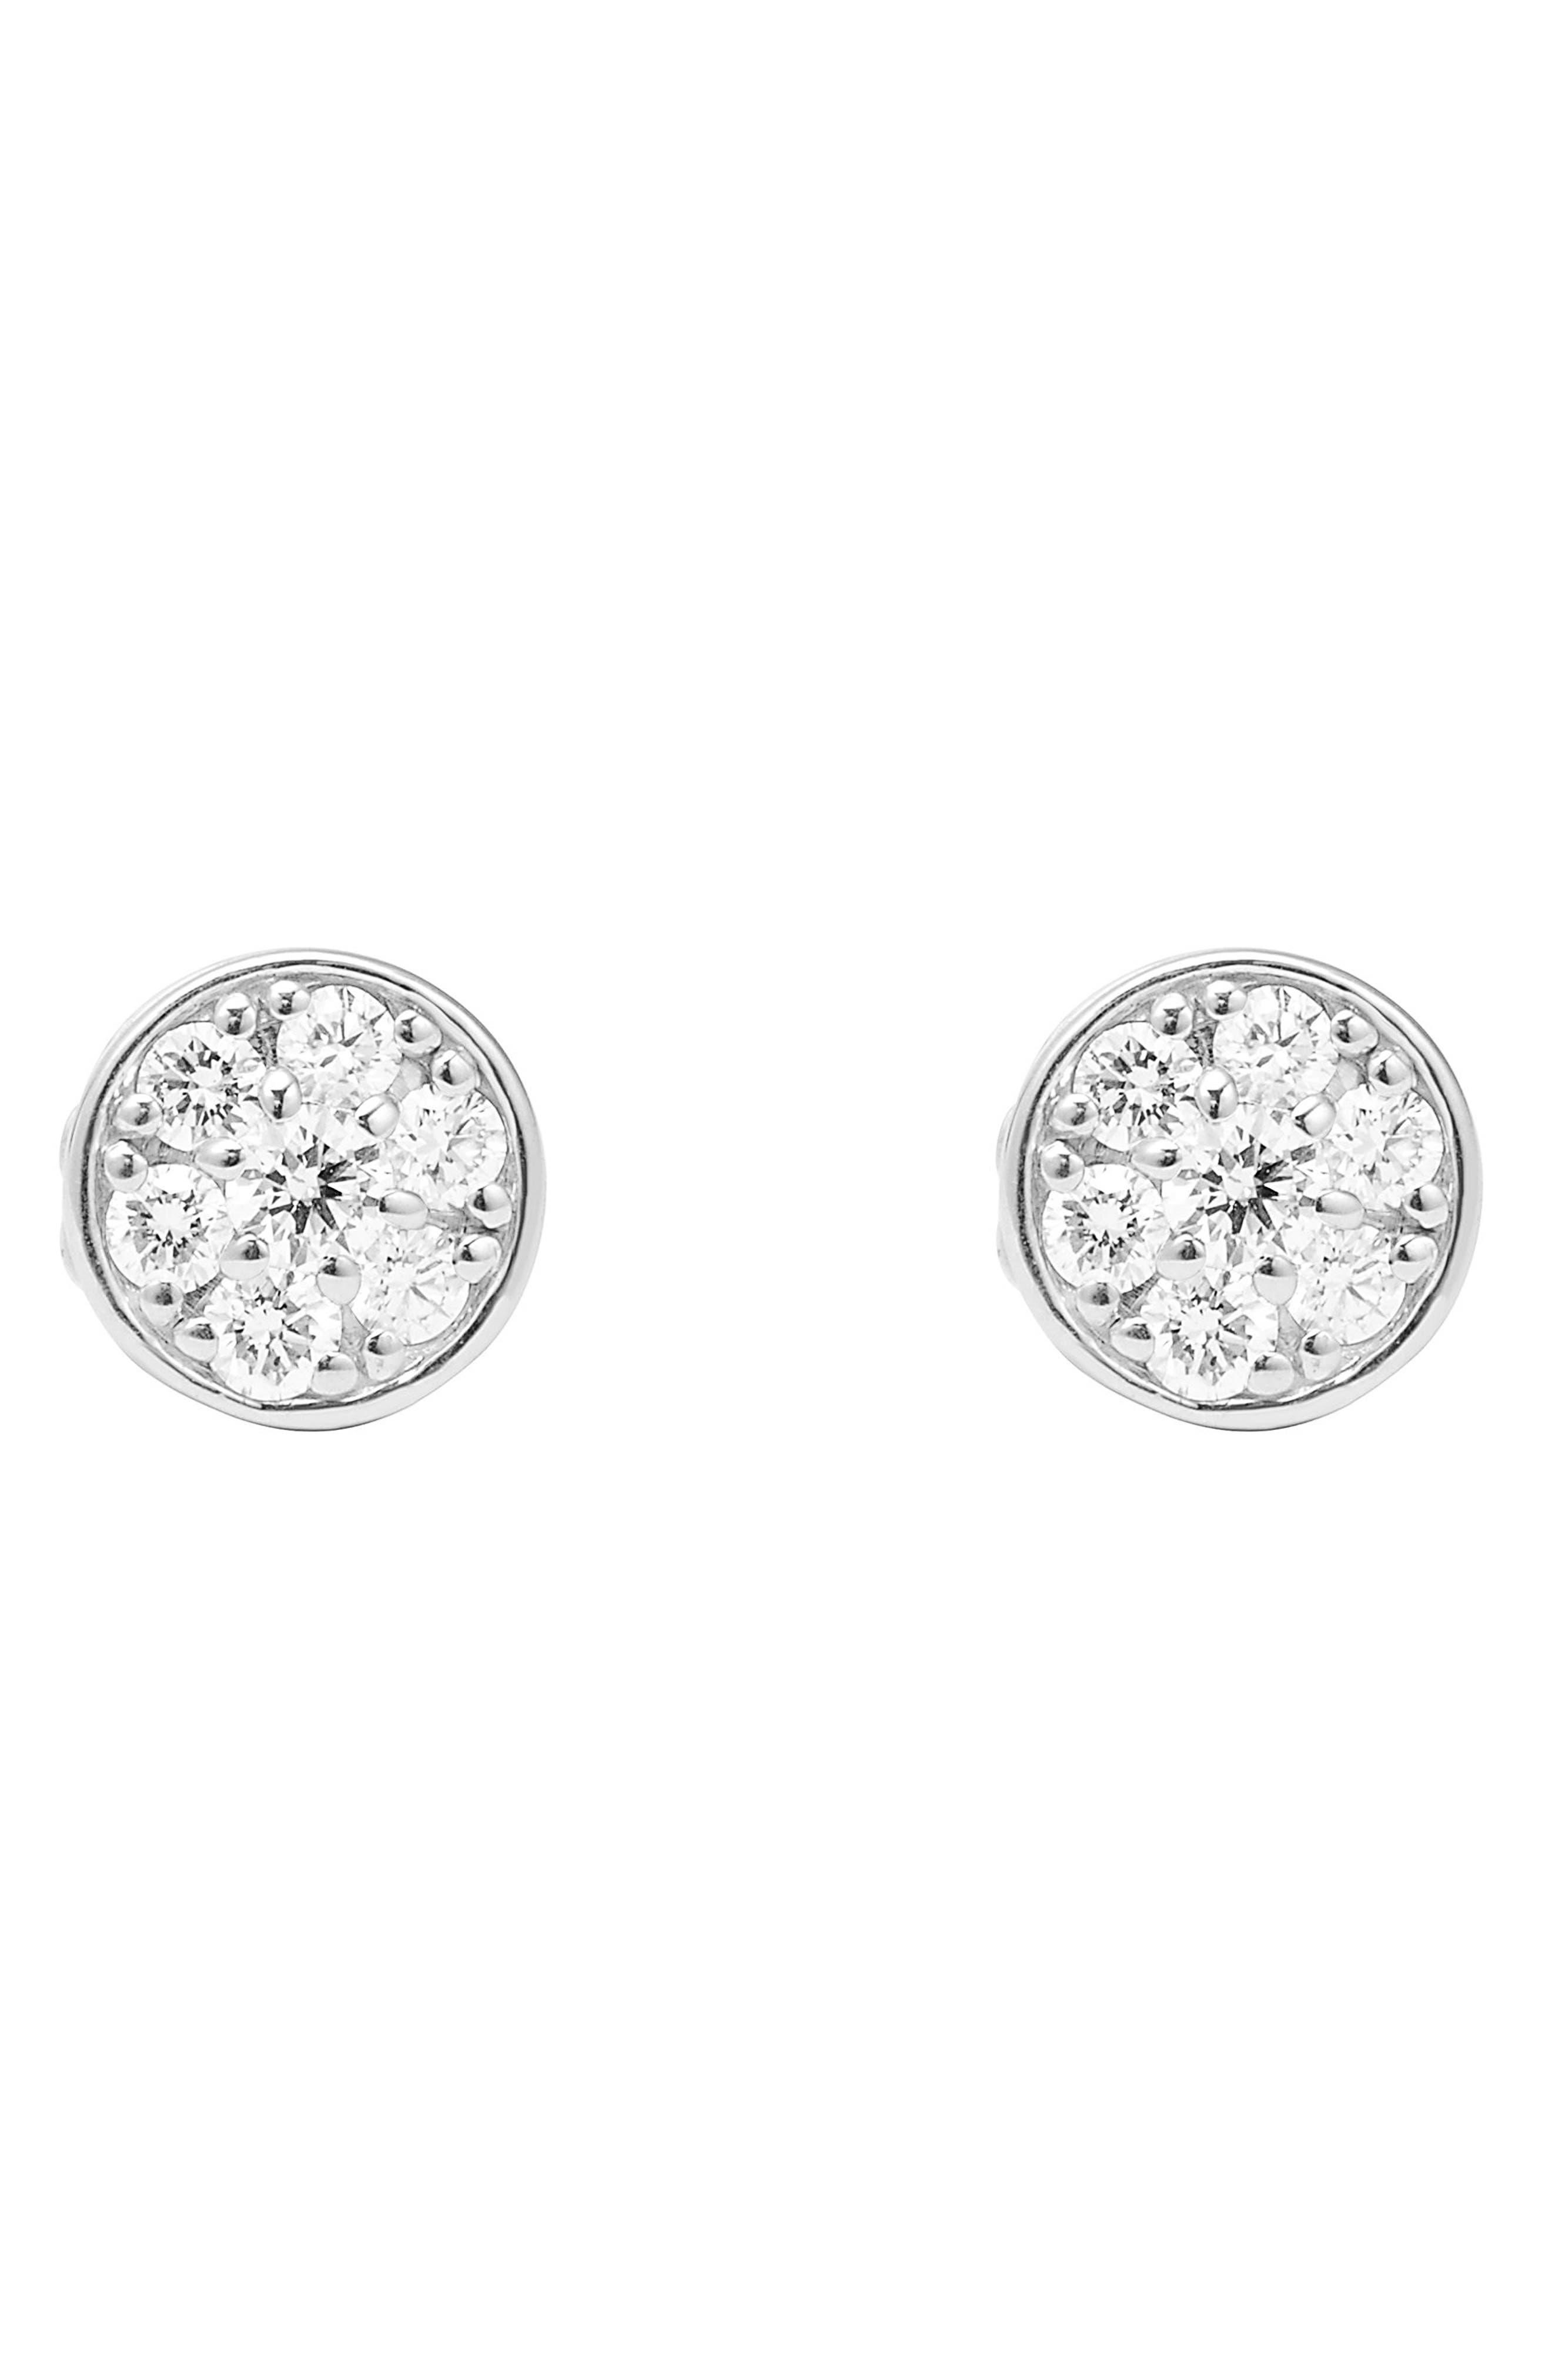 Diamond & Caviar Stud Earrings,                             Alternate thumbnail 4, color,                             040